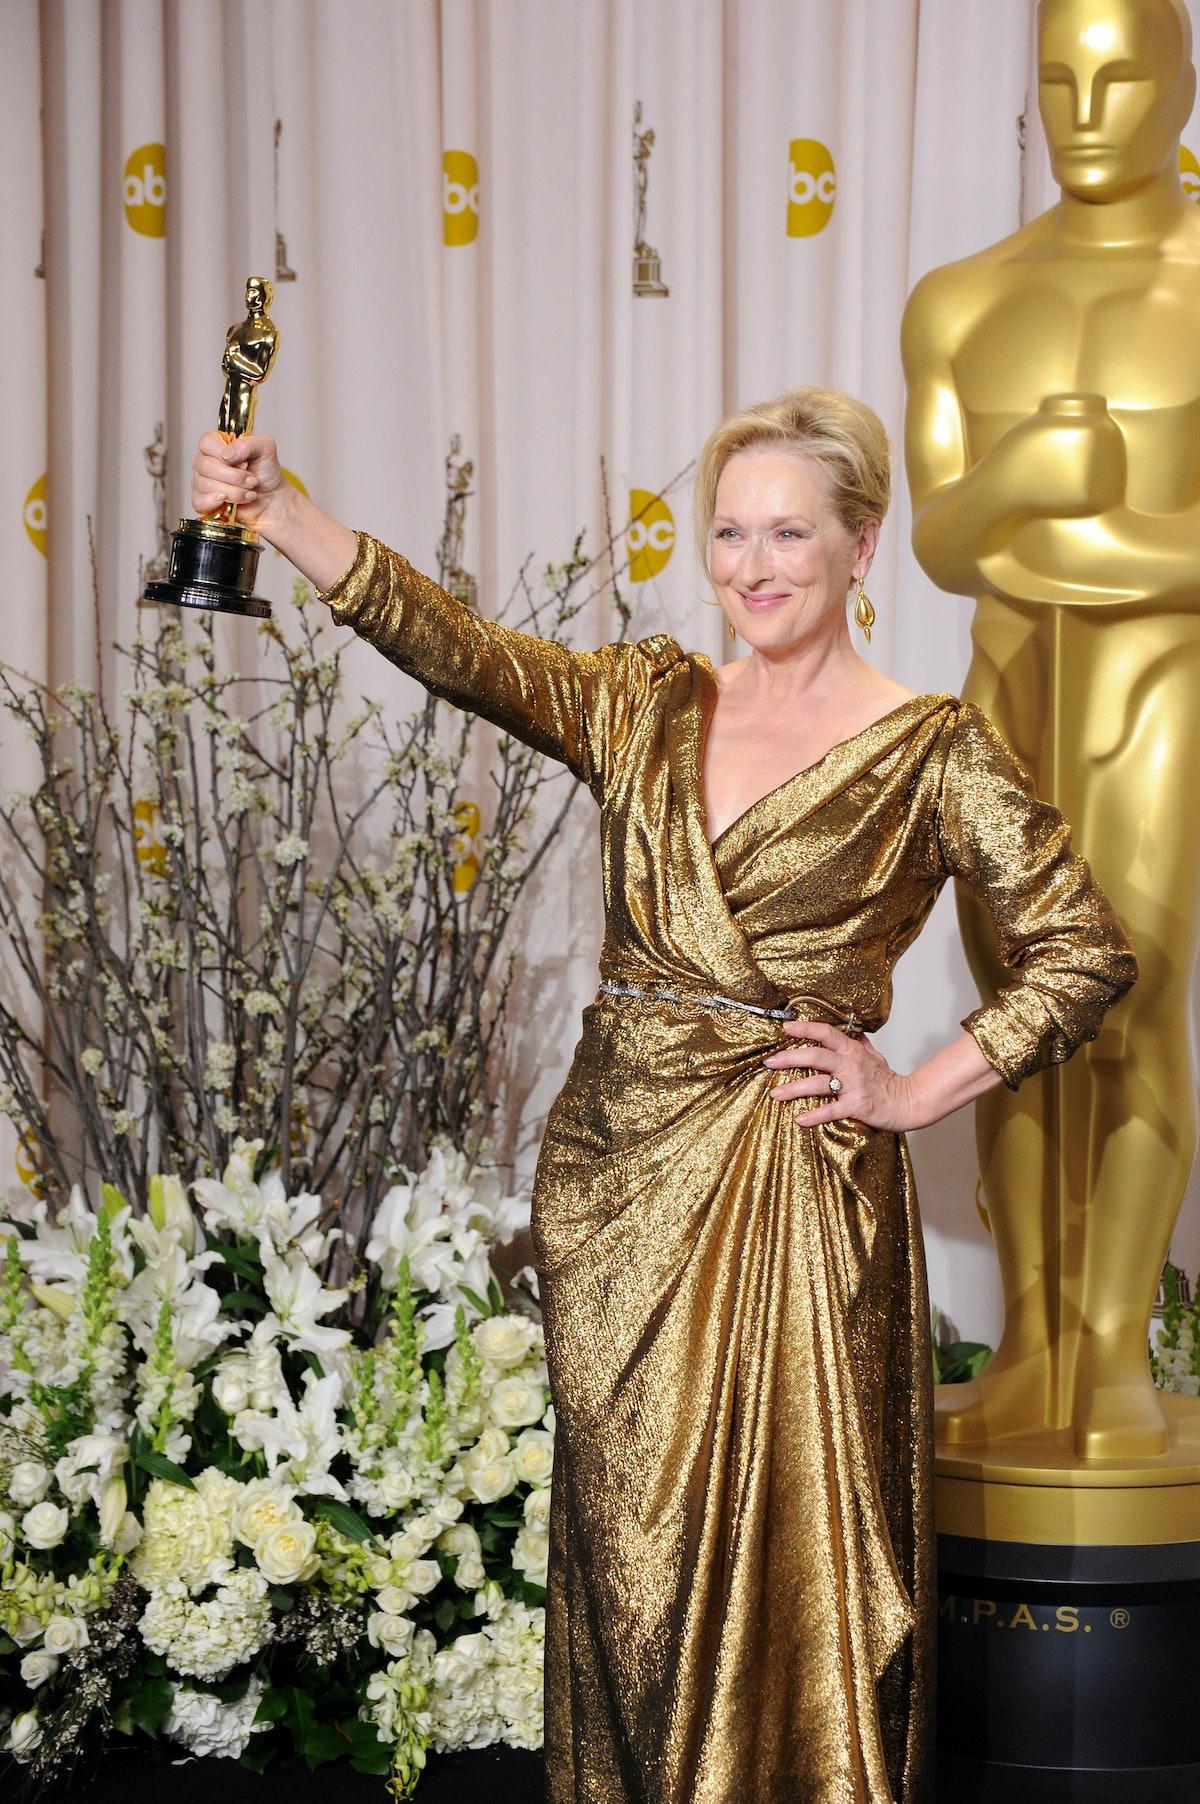 Meryl Streep with Oscar in gold gown.